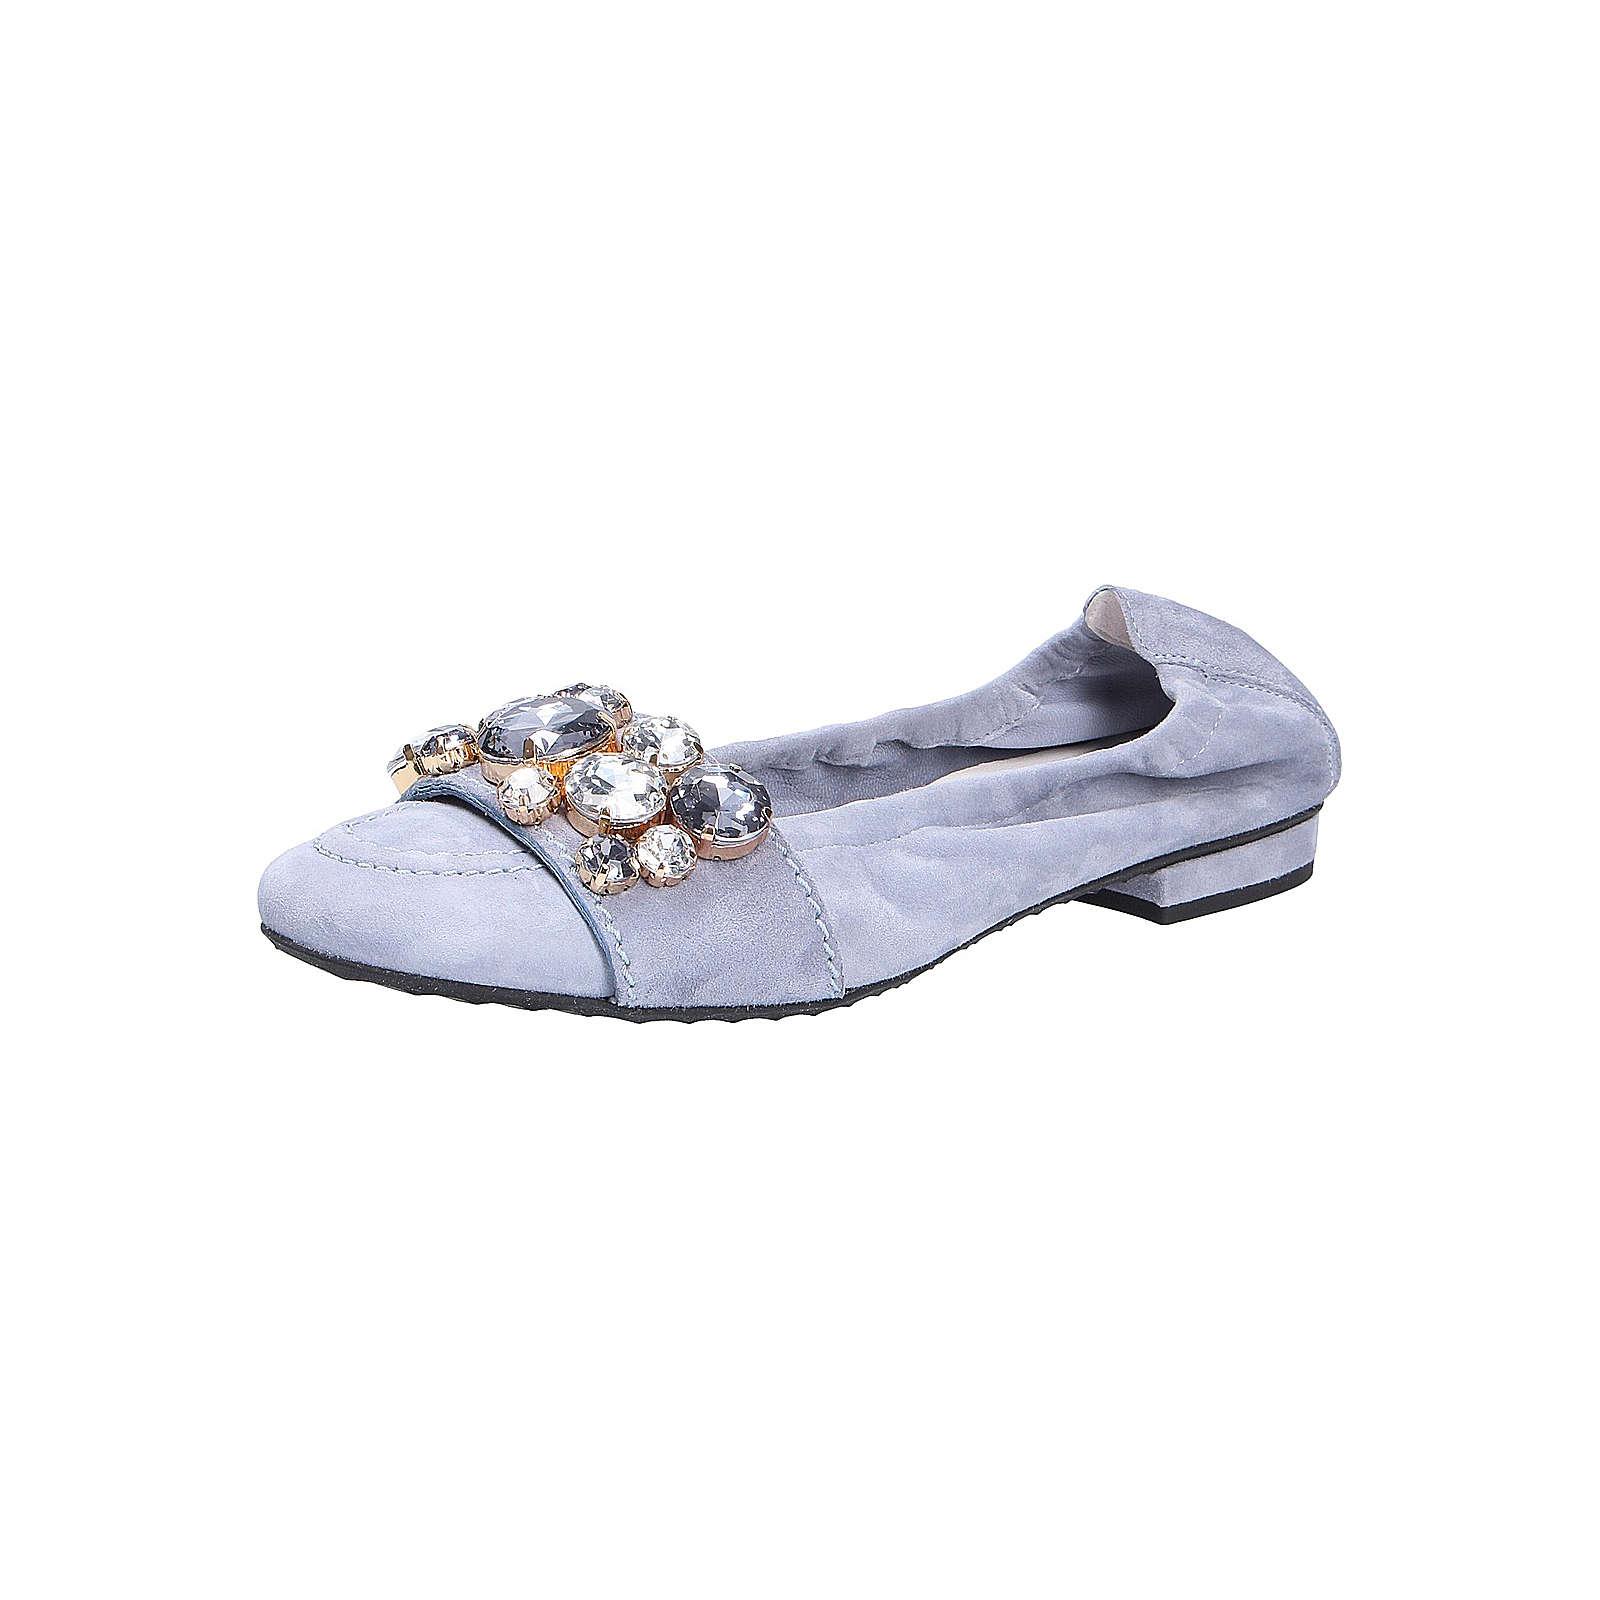 Kennel & Schmenger Fashion Ballerina blau Damen Gr. 36